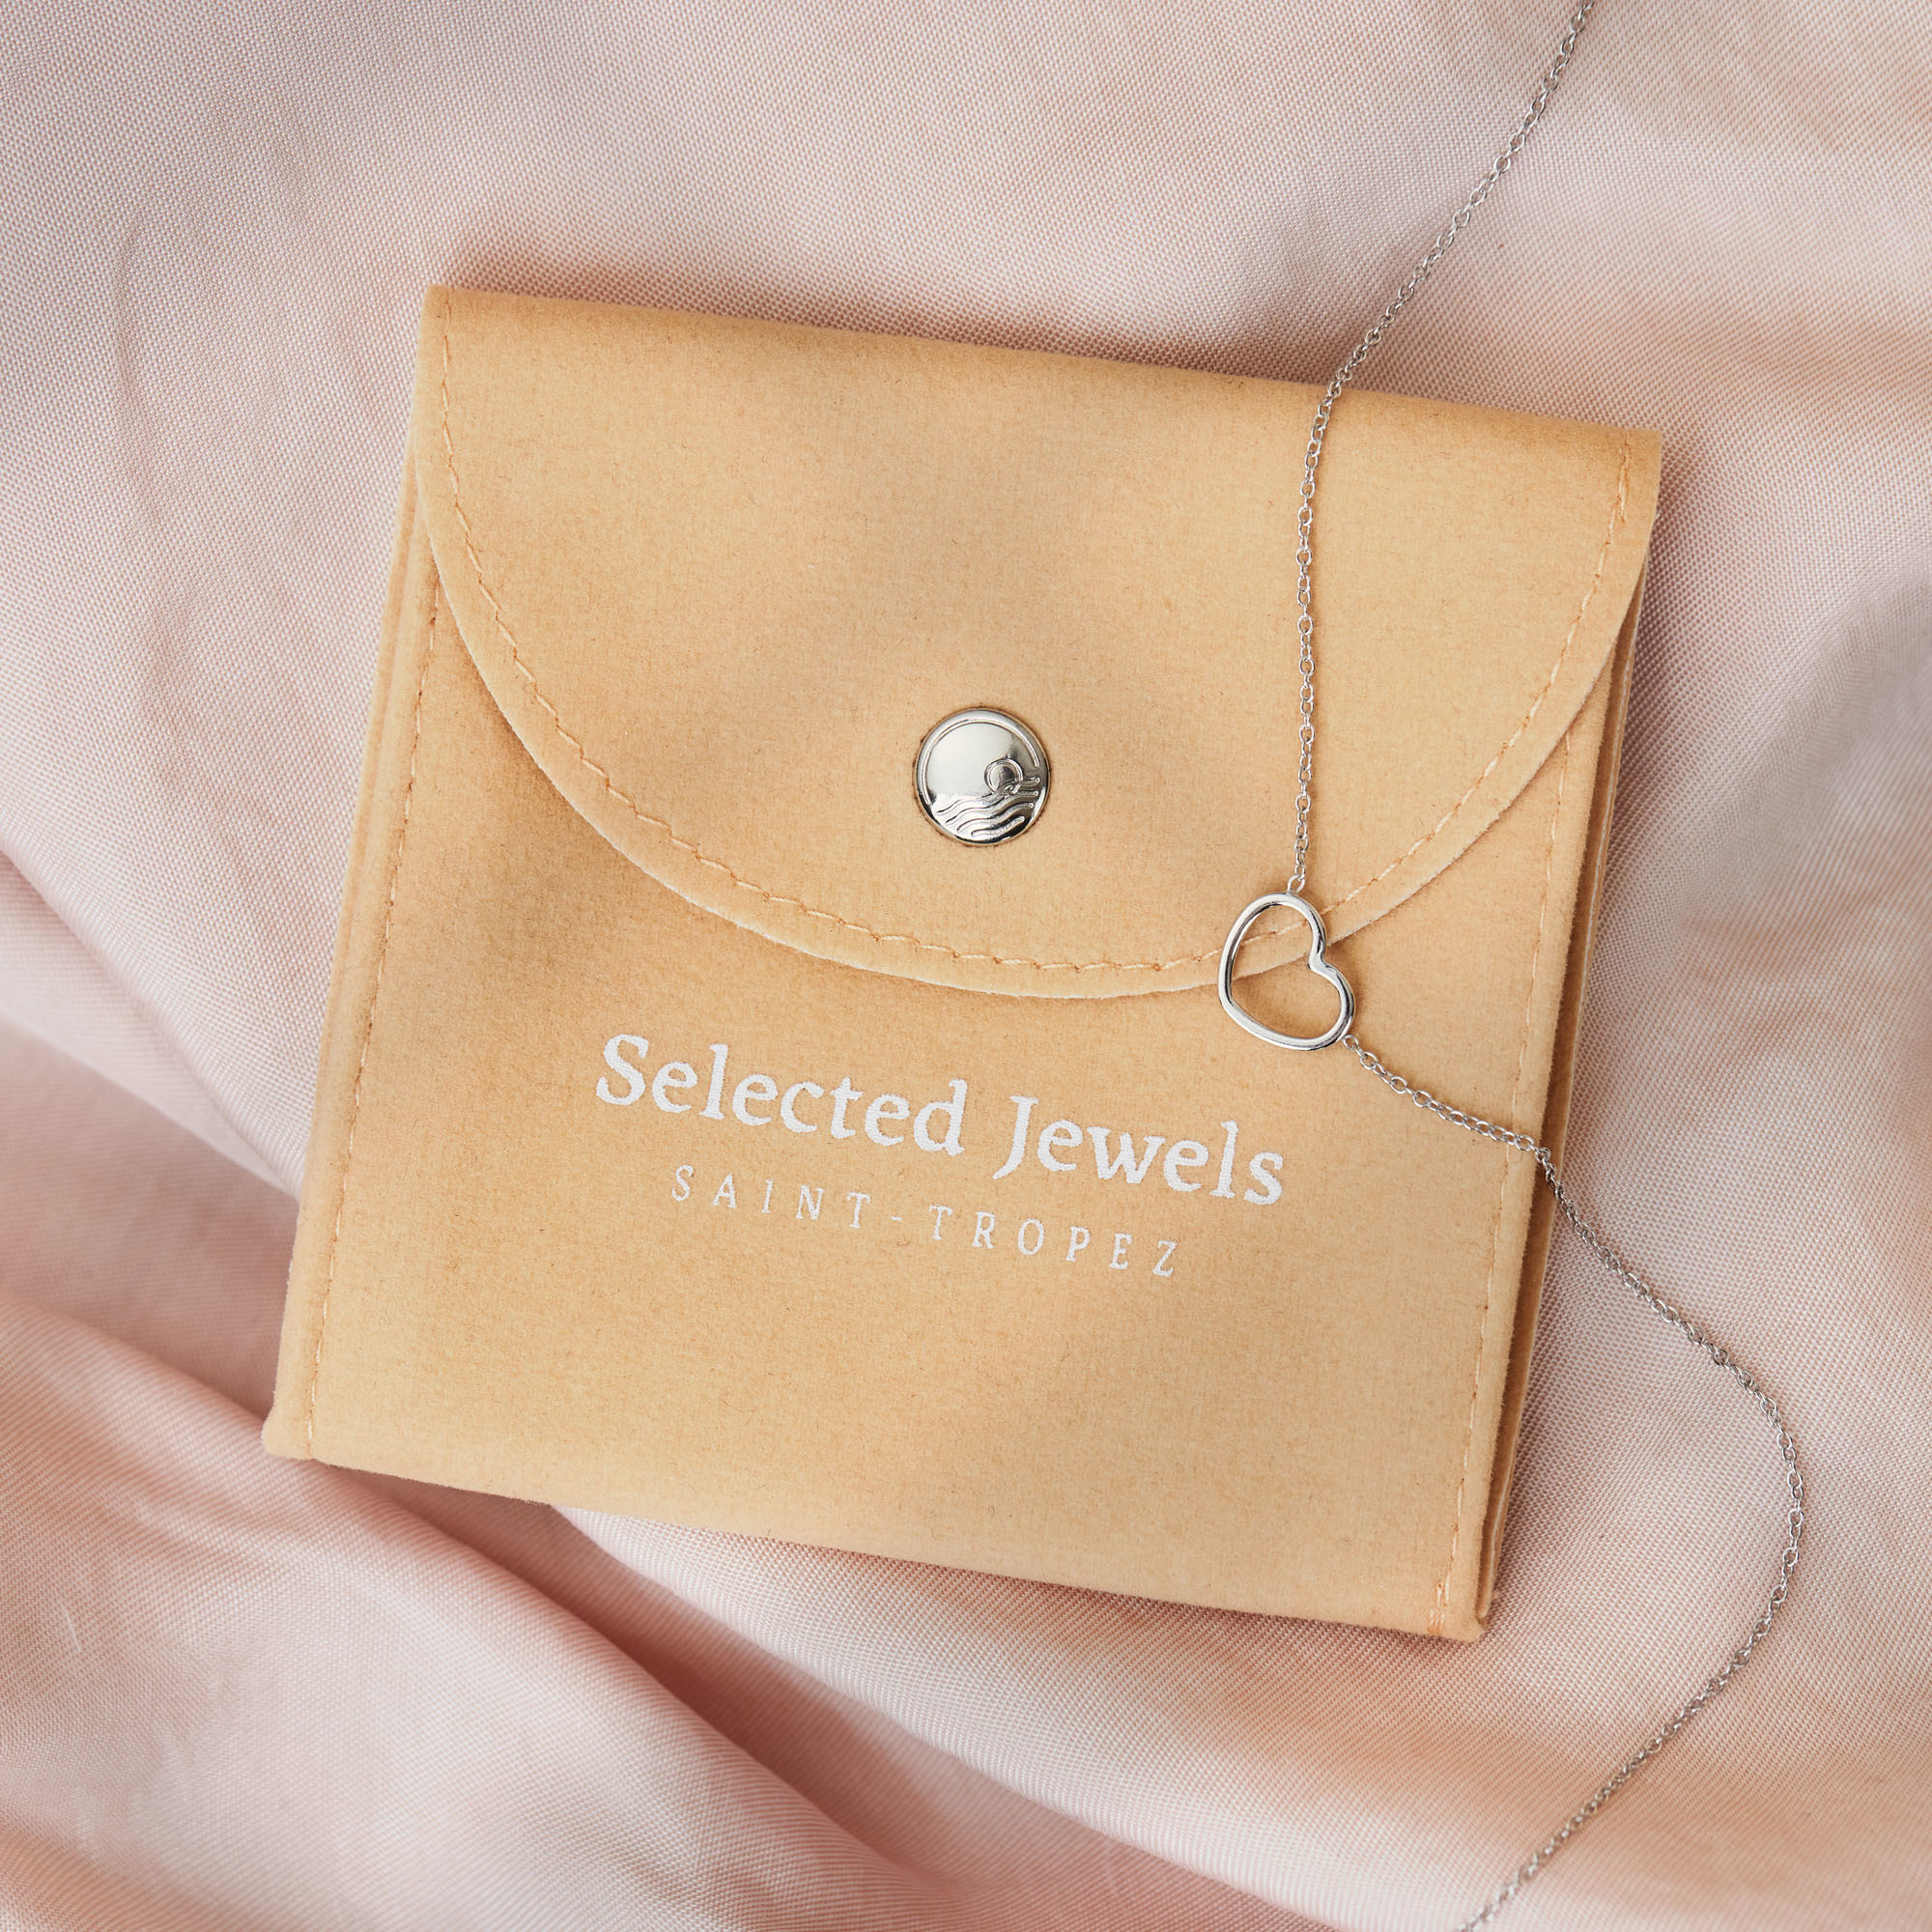 Selected Jewels Julie Esthée creole in argento sterling 925